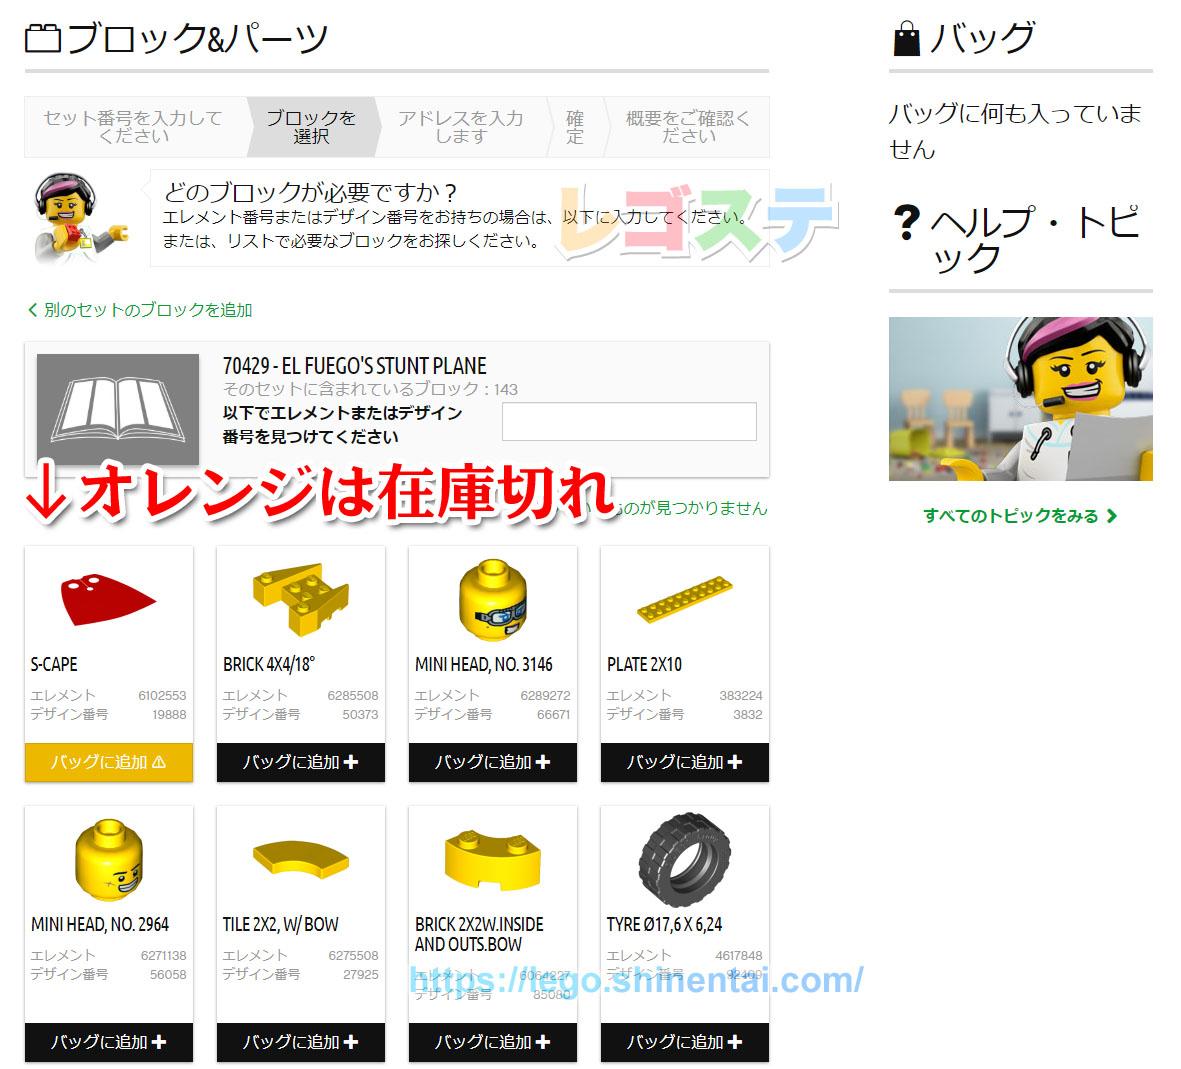 LEGOで足りないブロックがあった場合の対処法:欠損パーツを無料で送ってもらう方法【初心者向け】